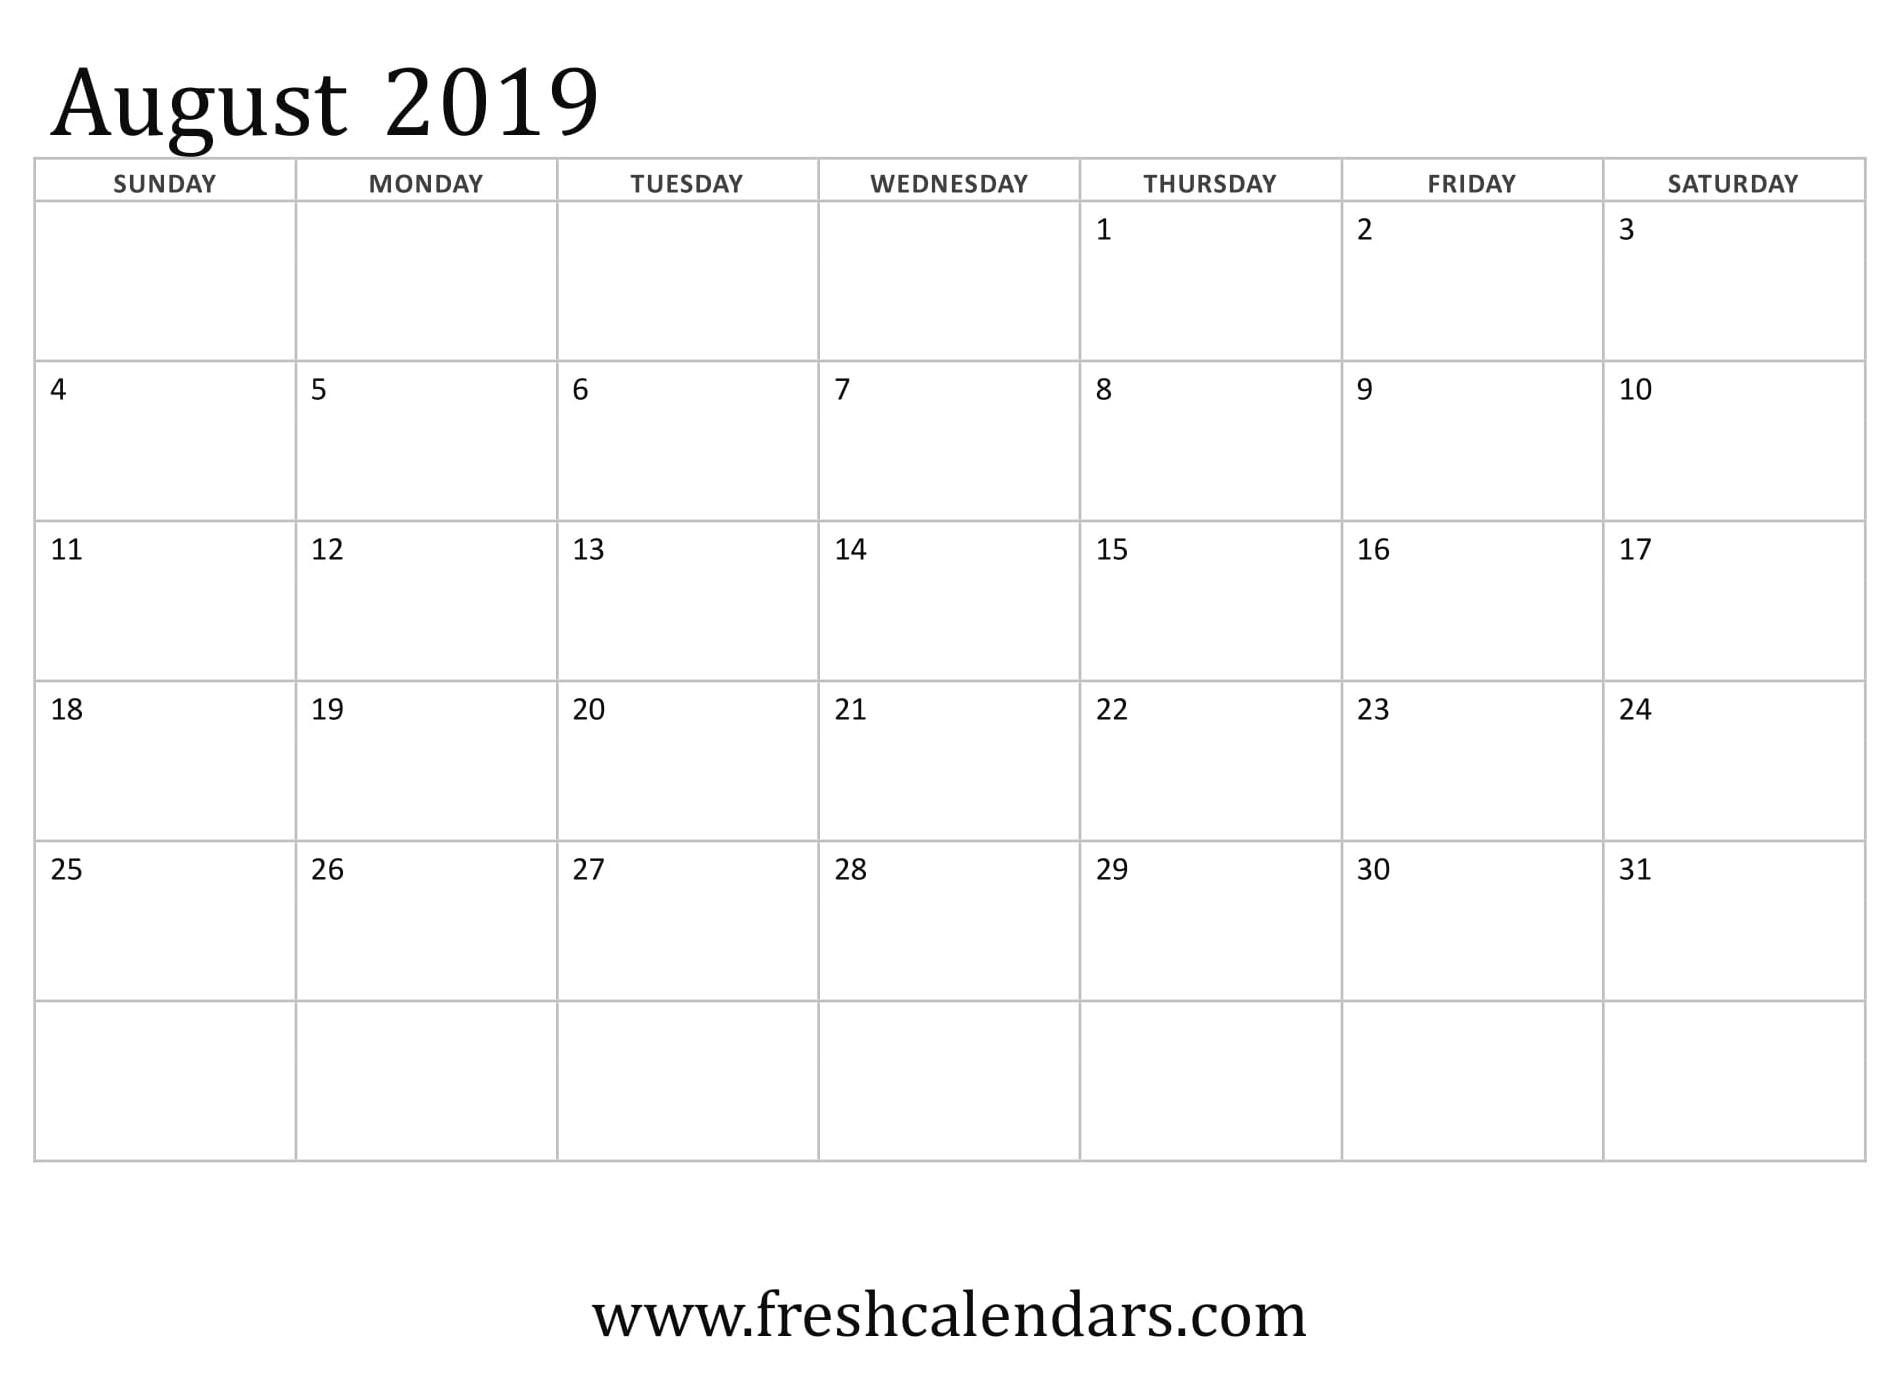 August 2019 Calendar Printable - Fresh Calendars  Monthly Calendar August  2020 8 X 11